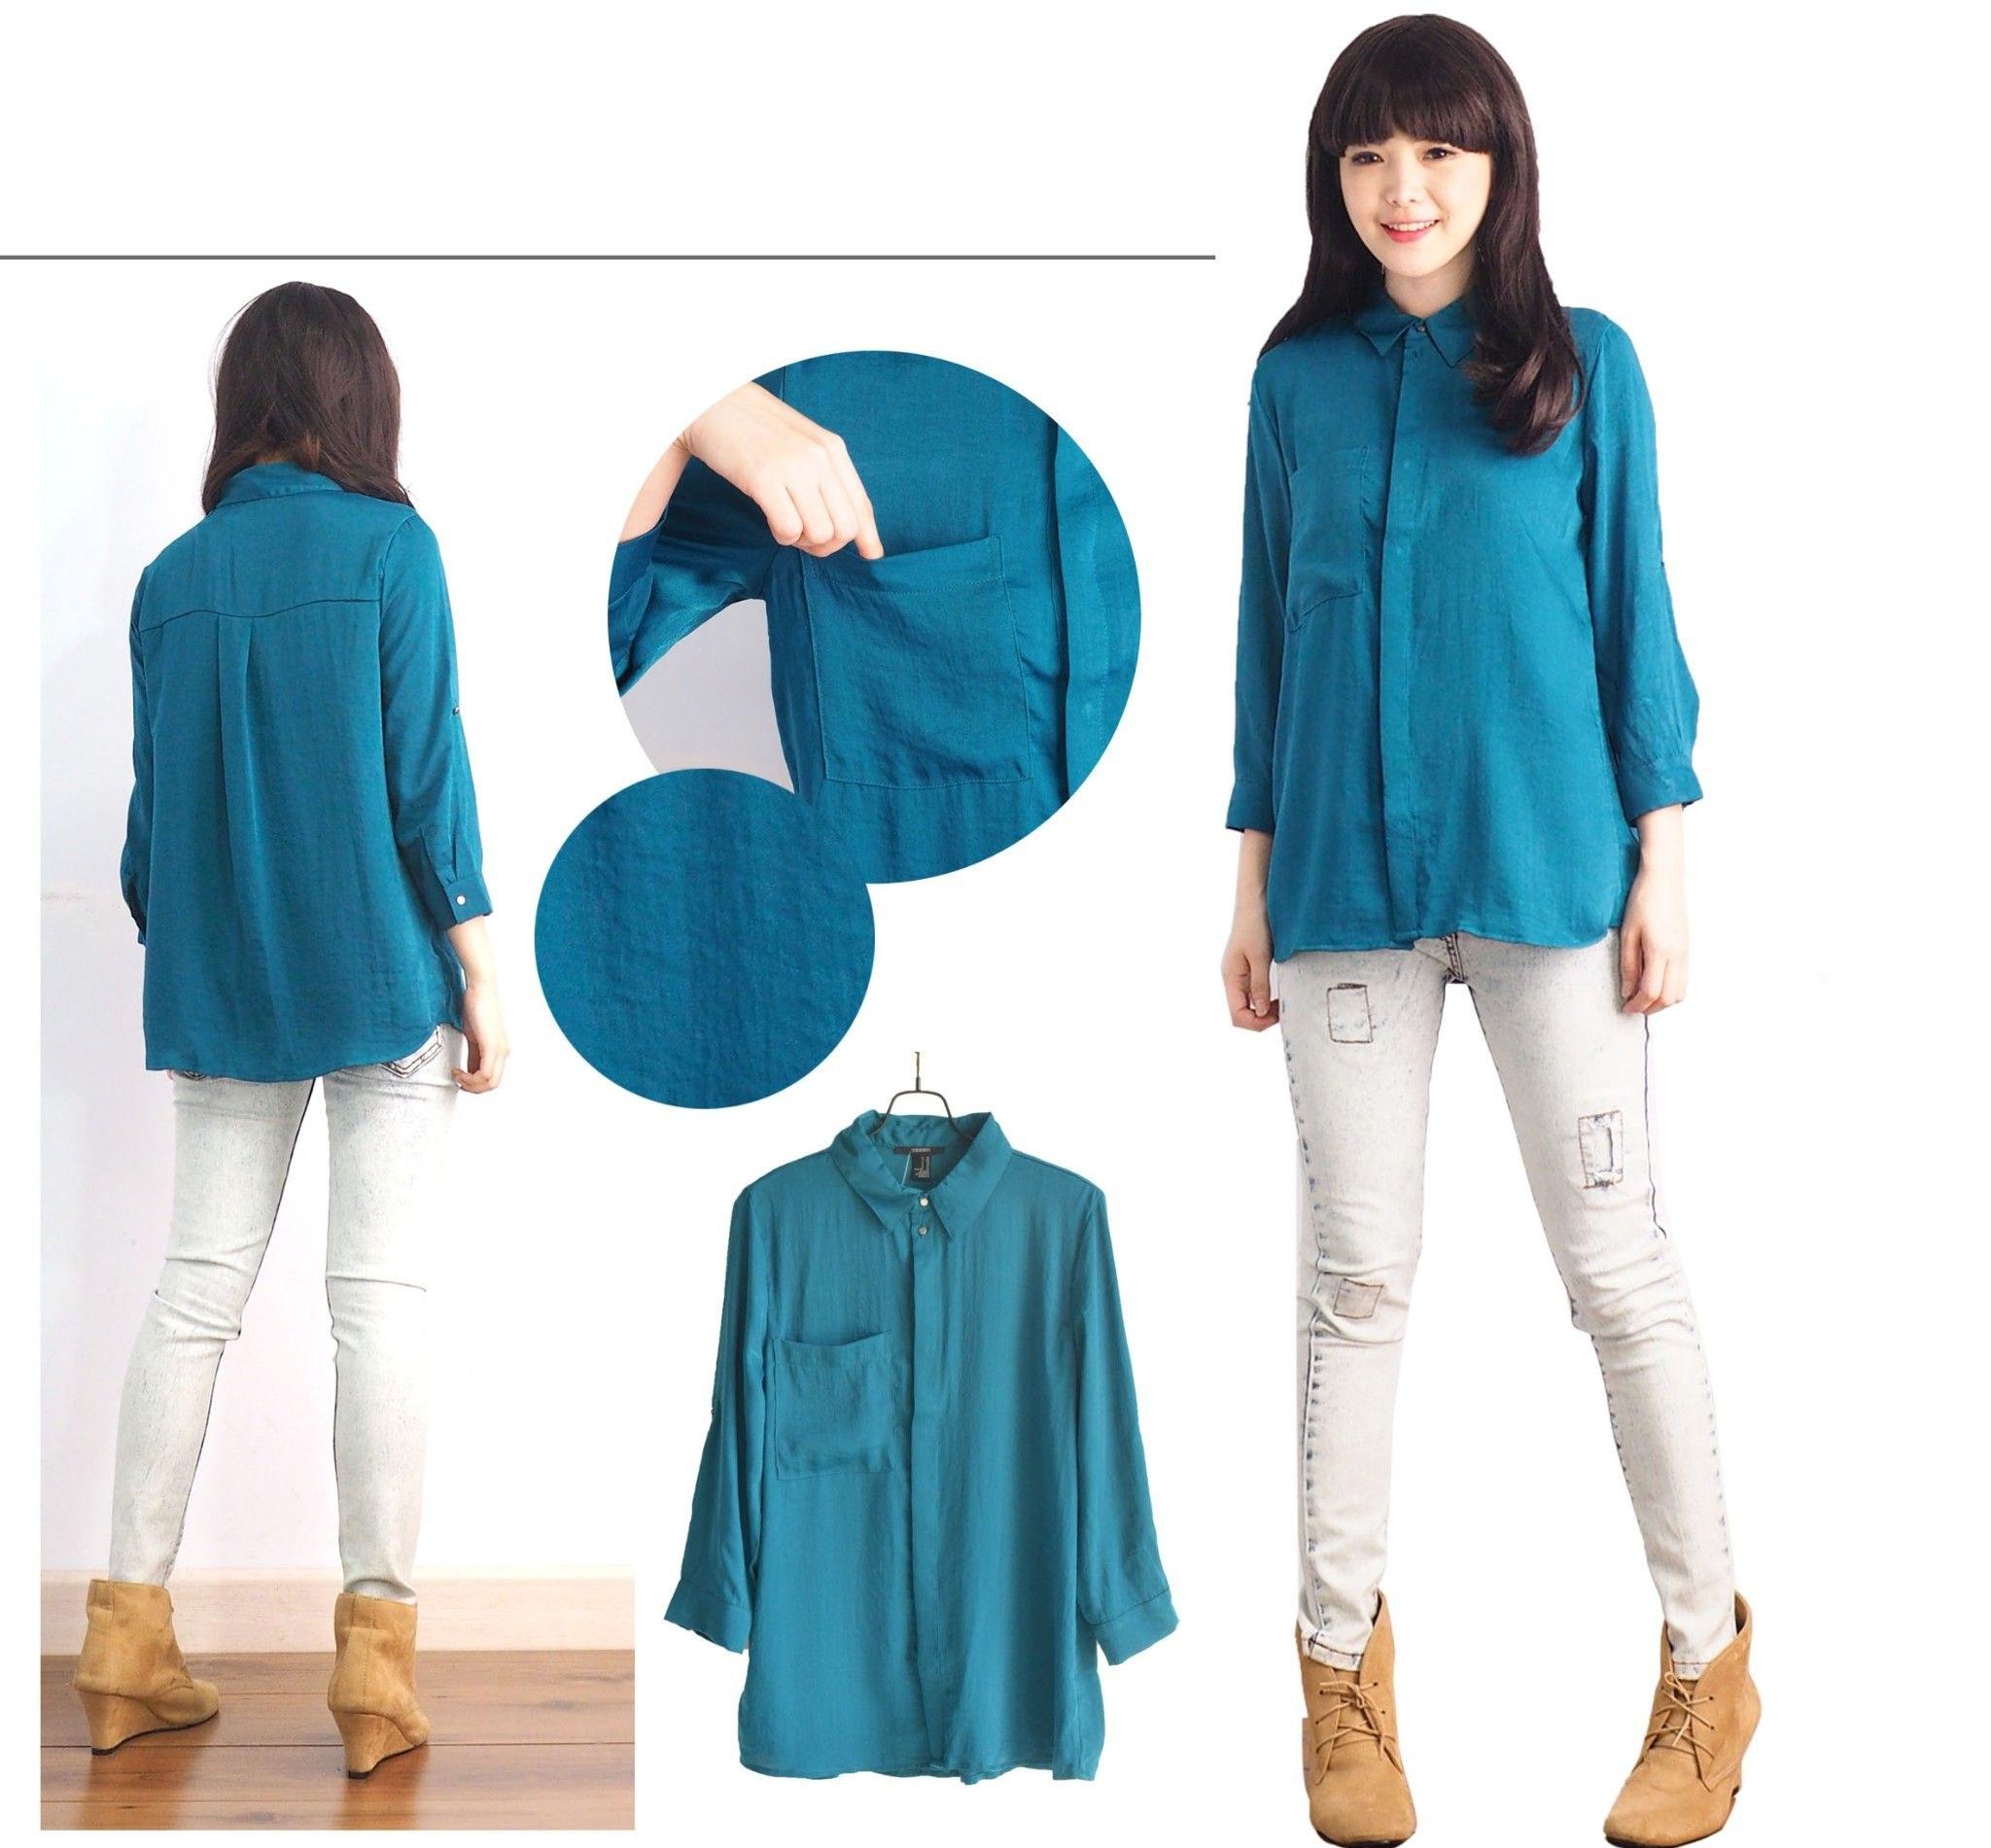 Ide Baju Lebaran Perempuan 87dx Blouse Muslim Model Pakaian Wanita Terbaru Pakaian Bayi